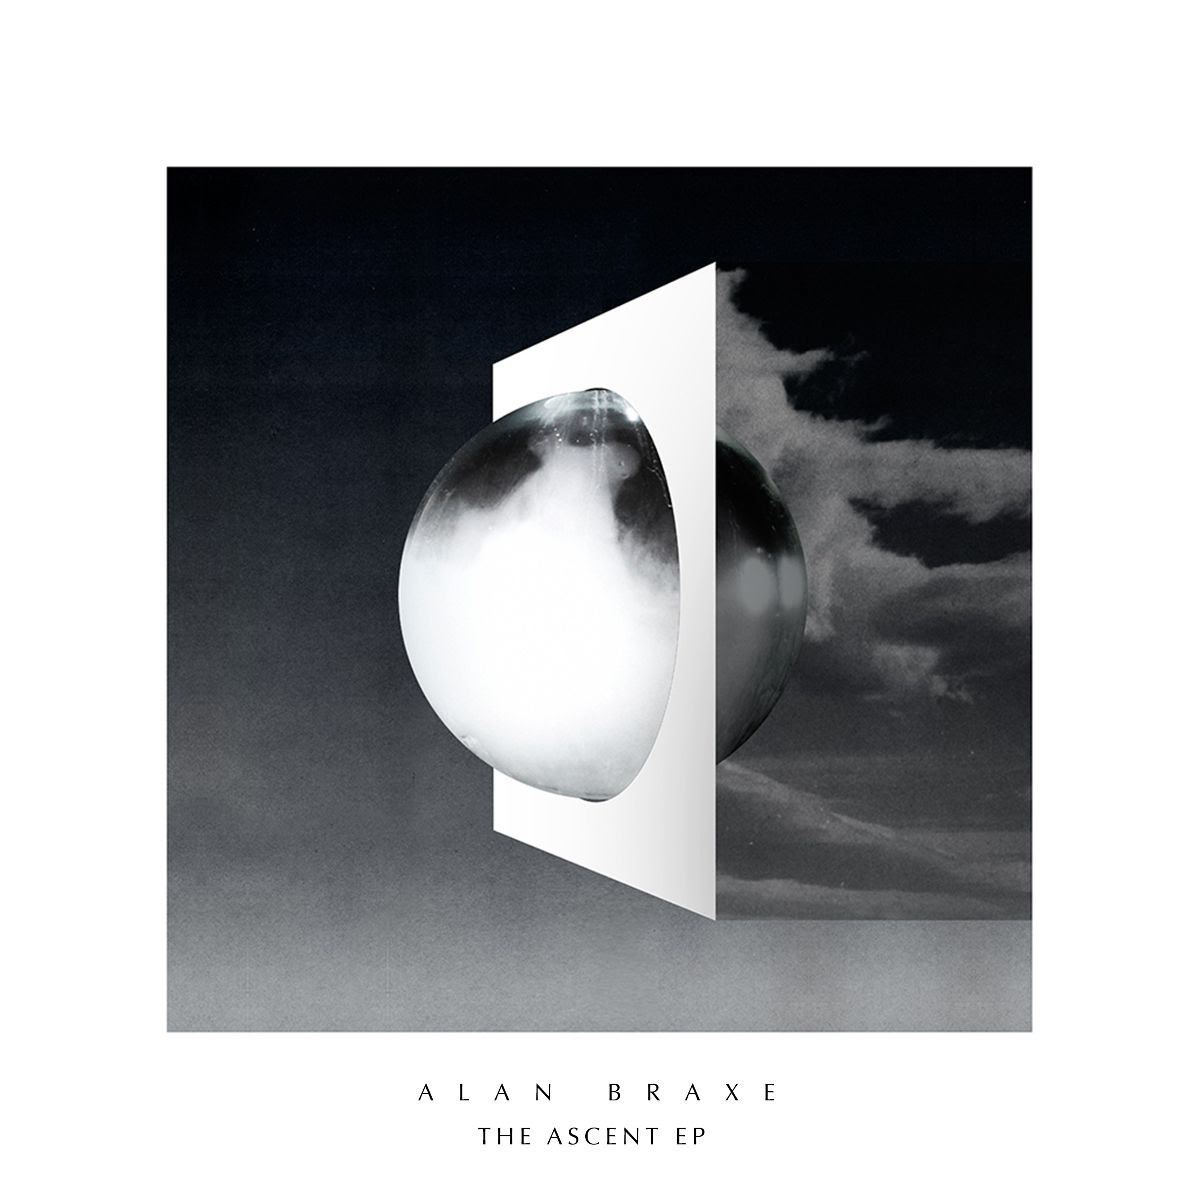 Alan Braxe The Ascent EP